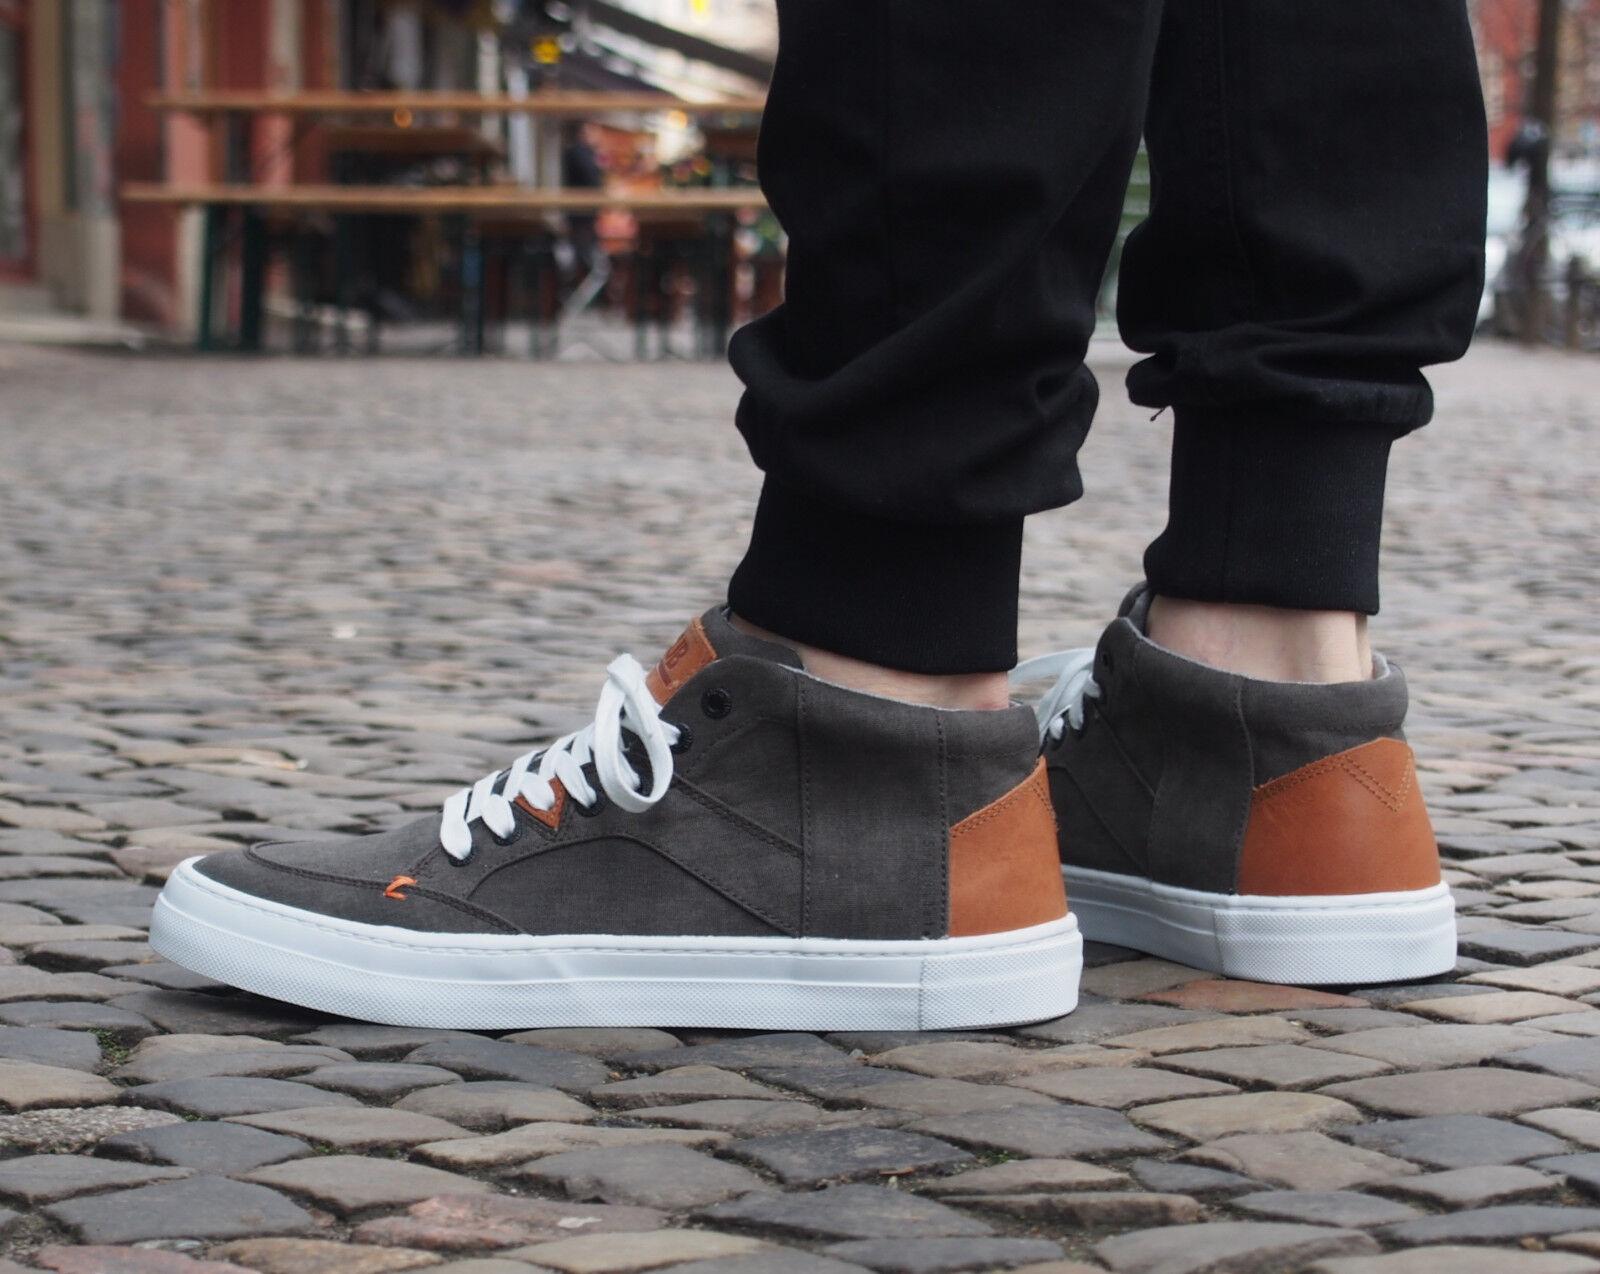 HUB Footwear Schuh Kingston Mid AC C06 schwarz Weiß Turnschuhe Herrenschuh NEU SALE